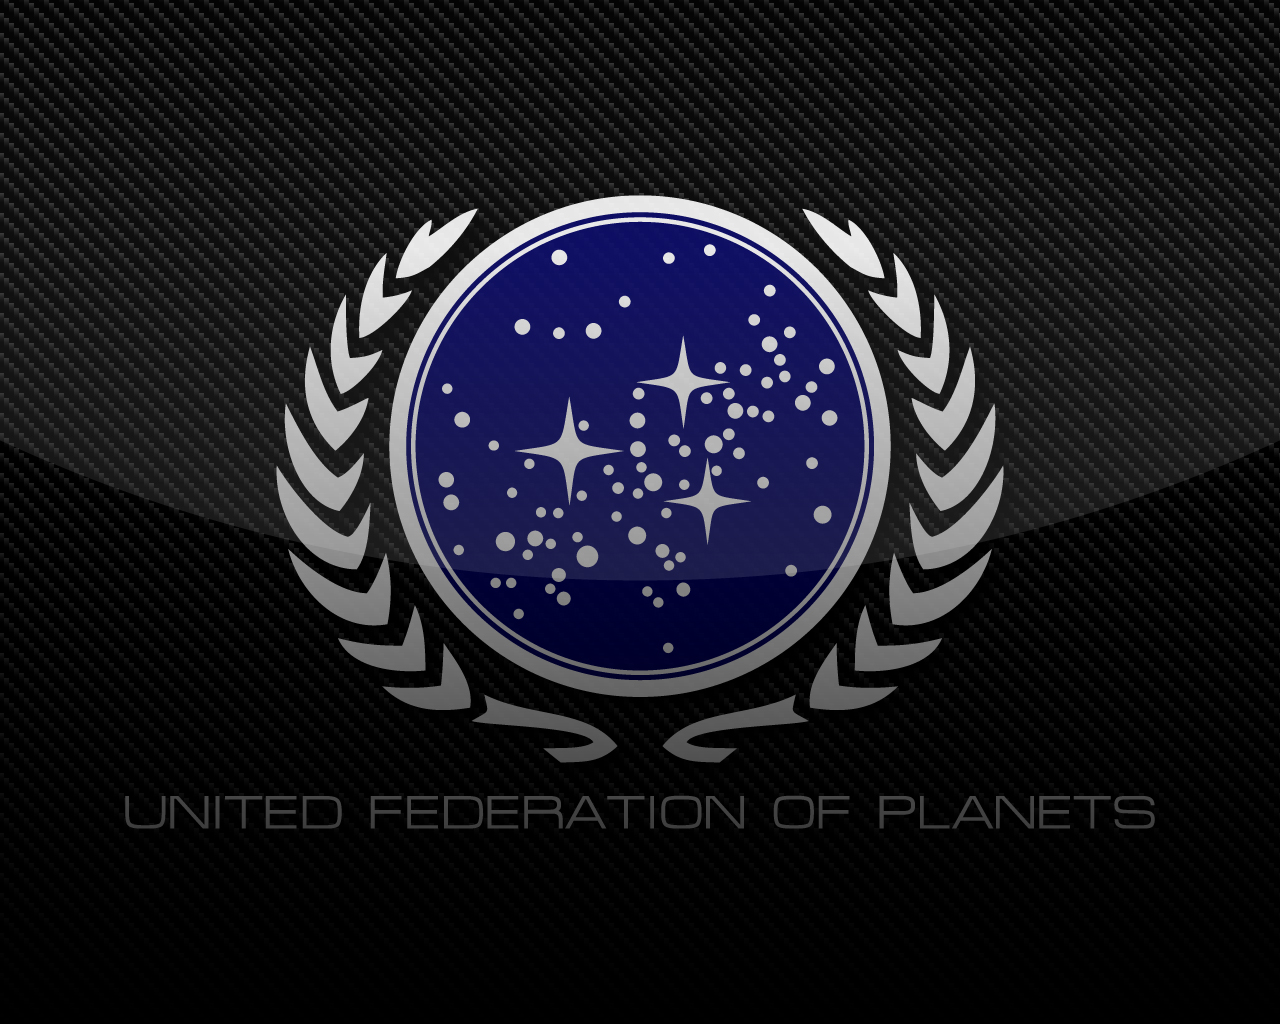 Free Download Star Trek Wallpaper 1280x1024 Star Trek United